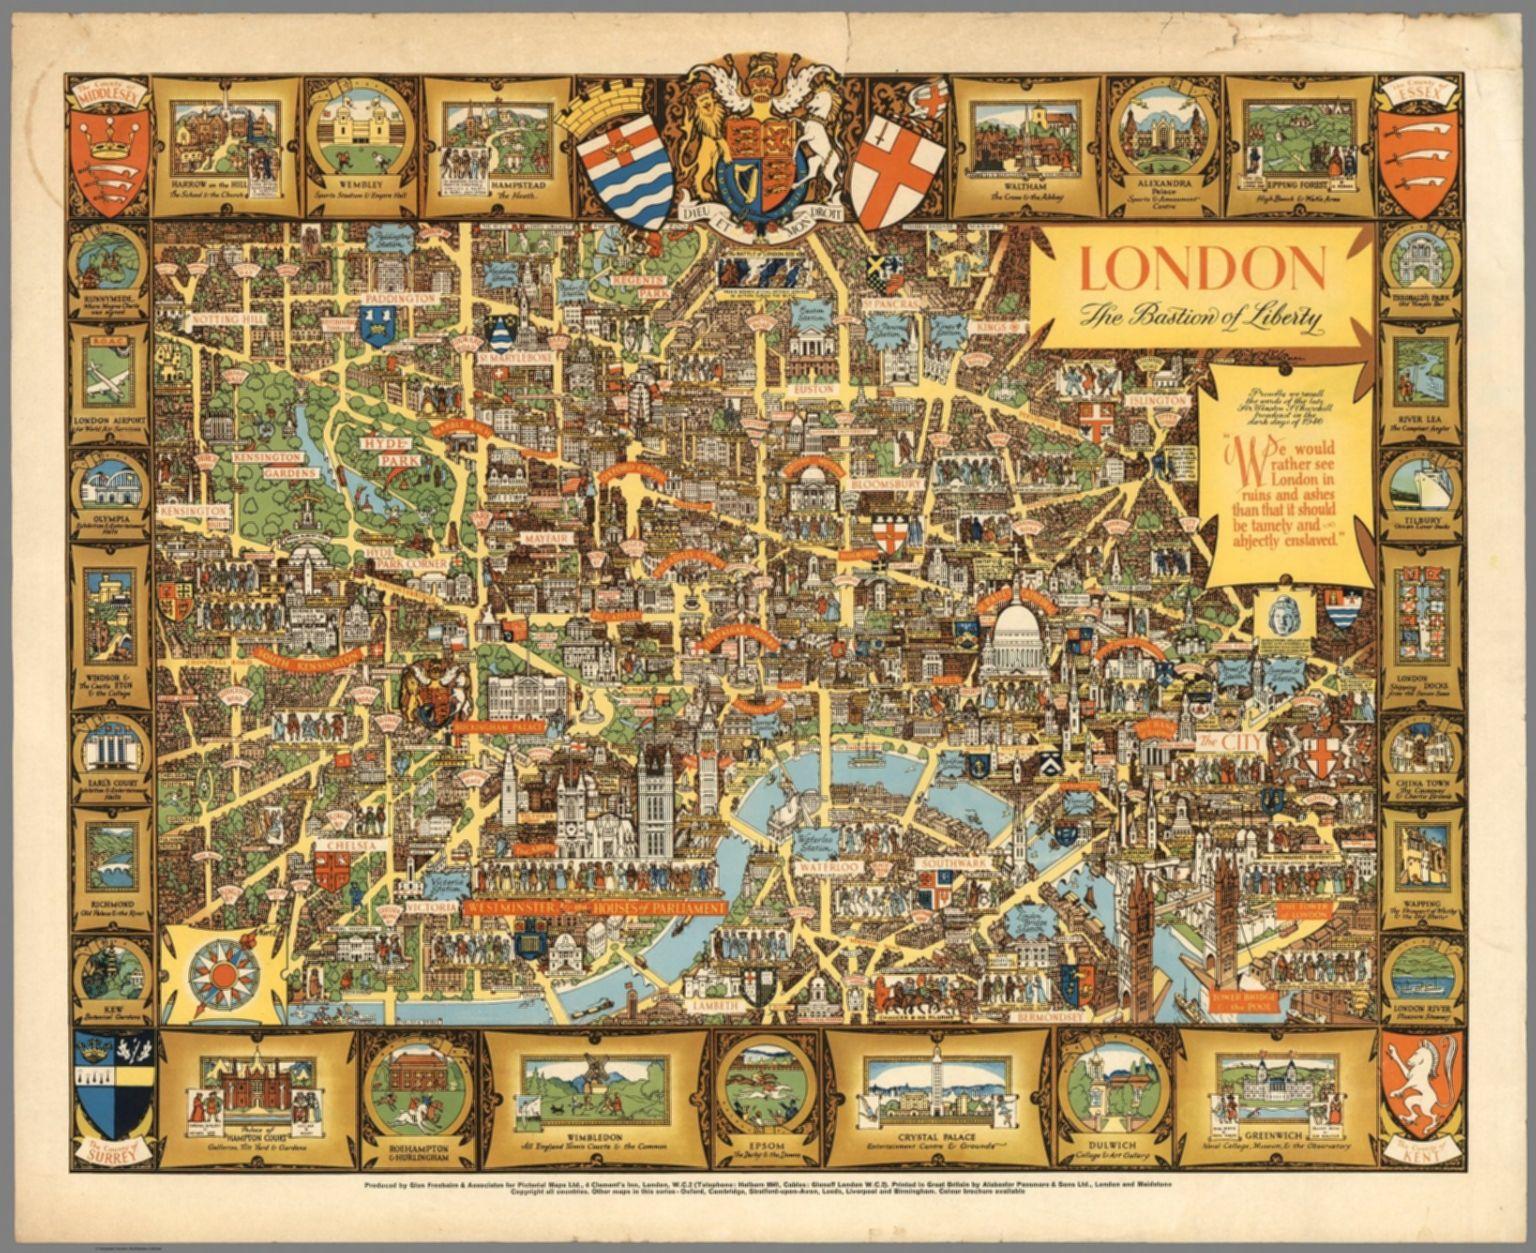 London The Bastion of Liberty David